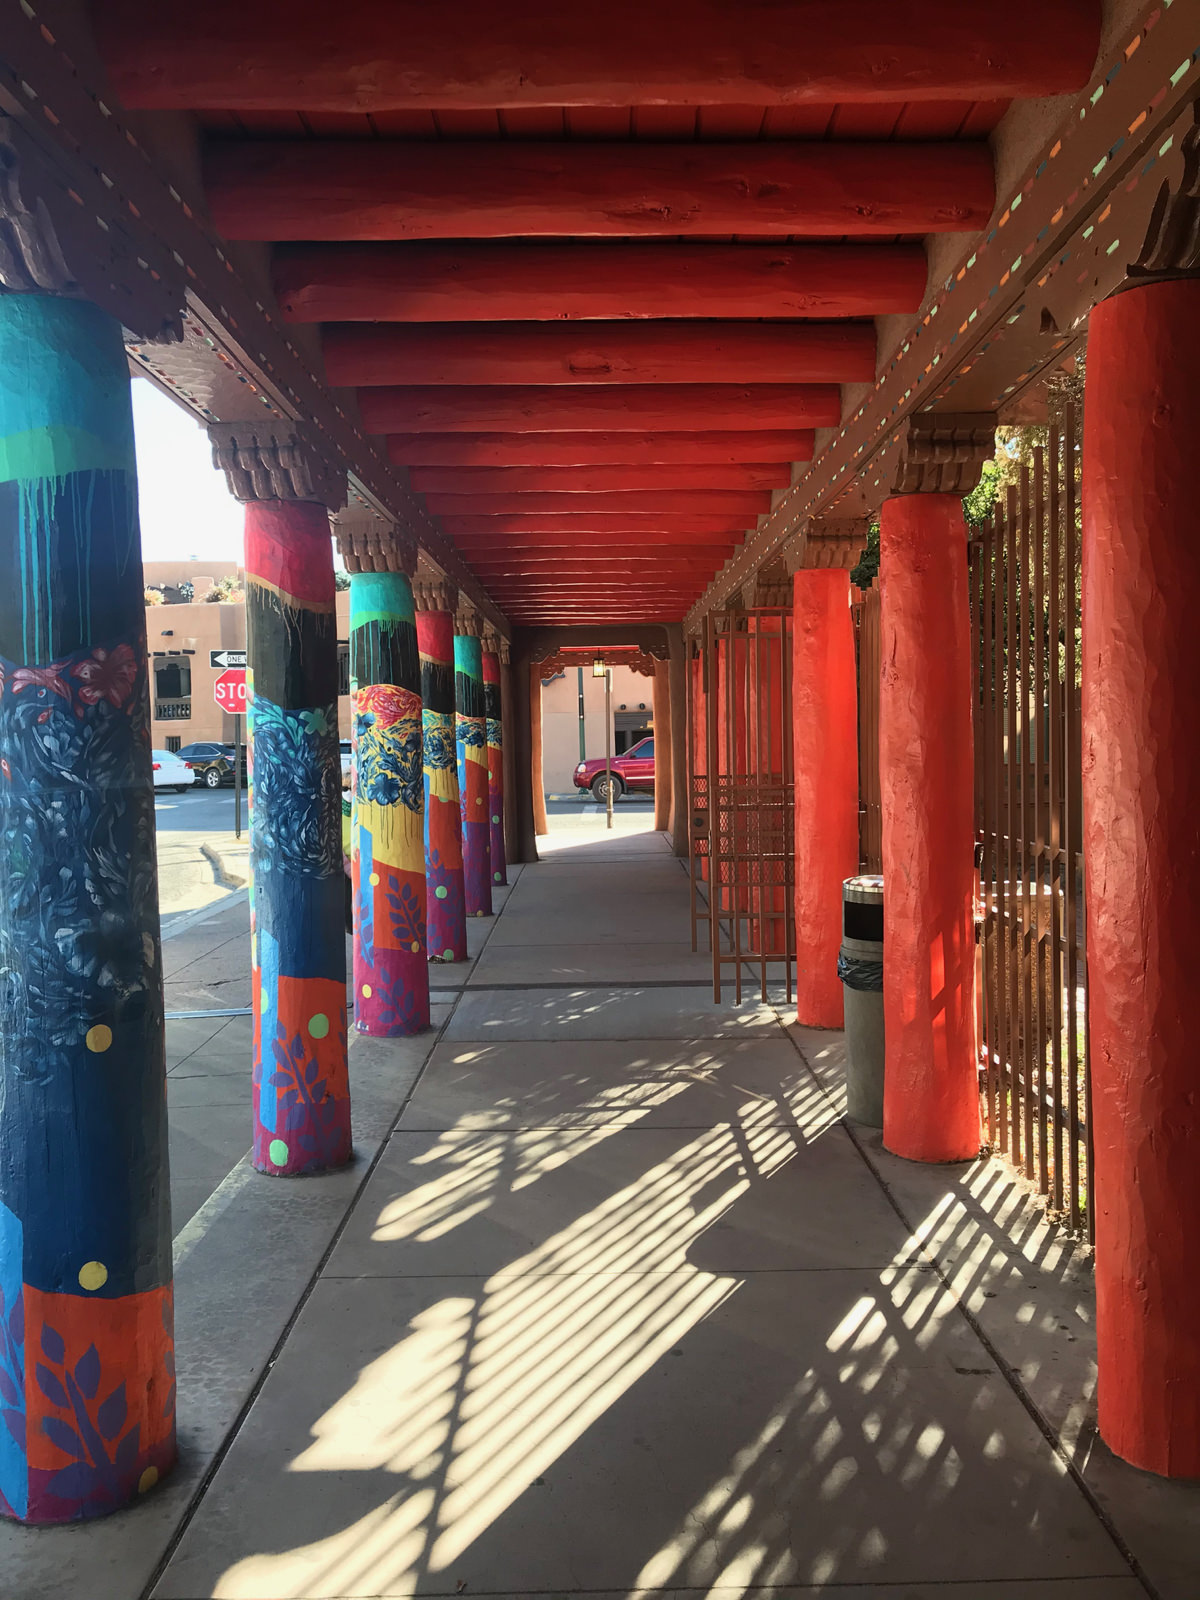 Streets of Santa Fe, NM